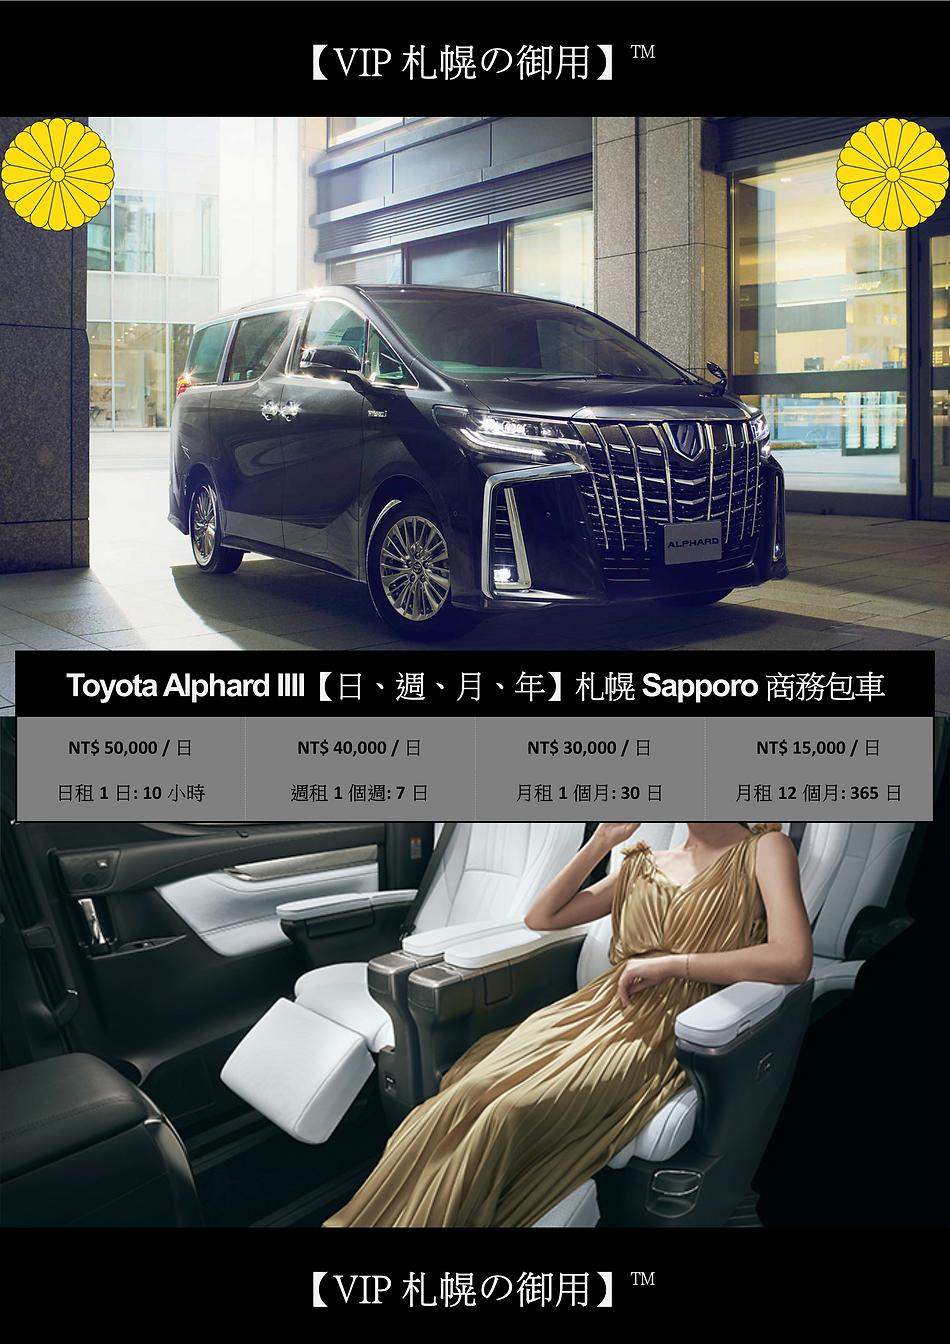 VIP札幌の御用 TOYOTA ALPHARD IIII DM.png